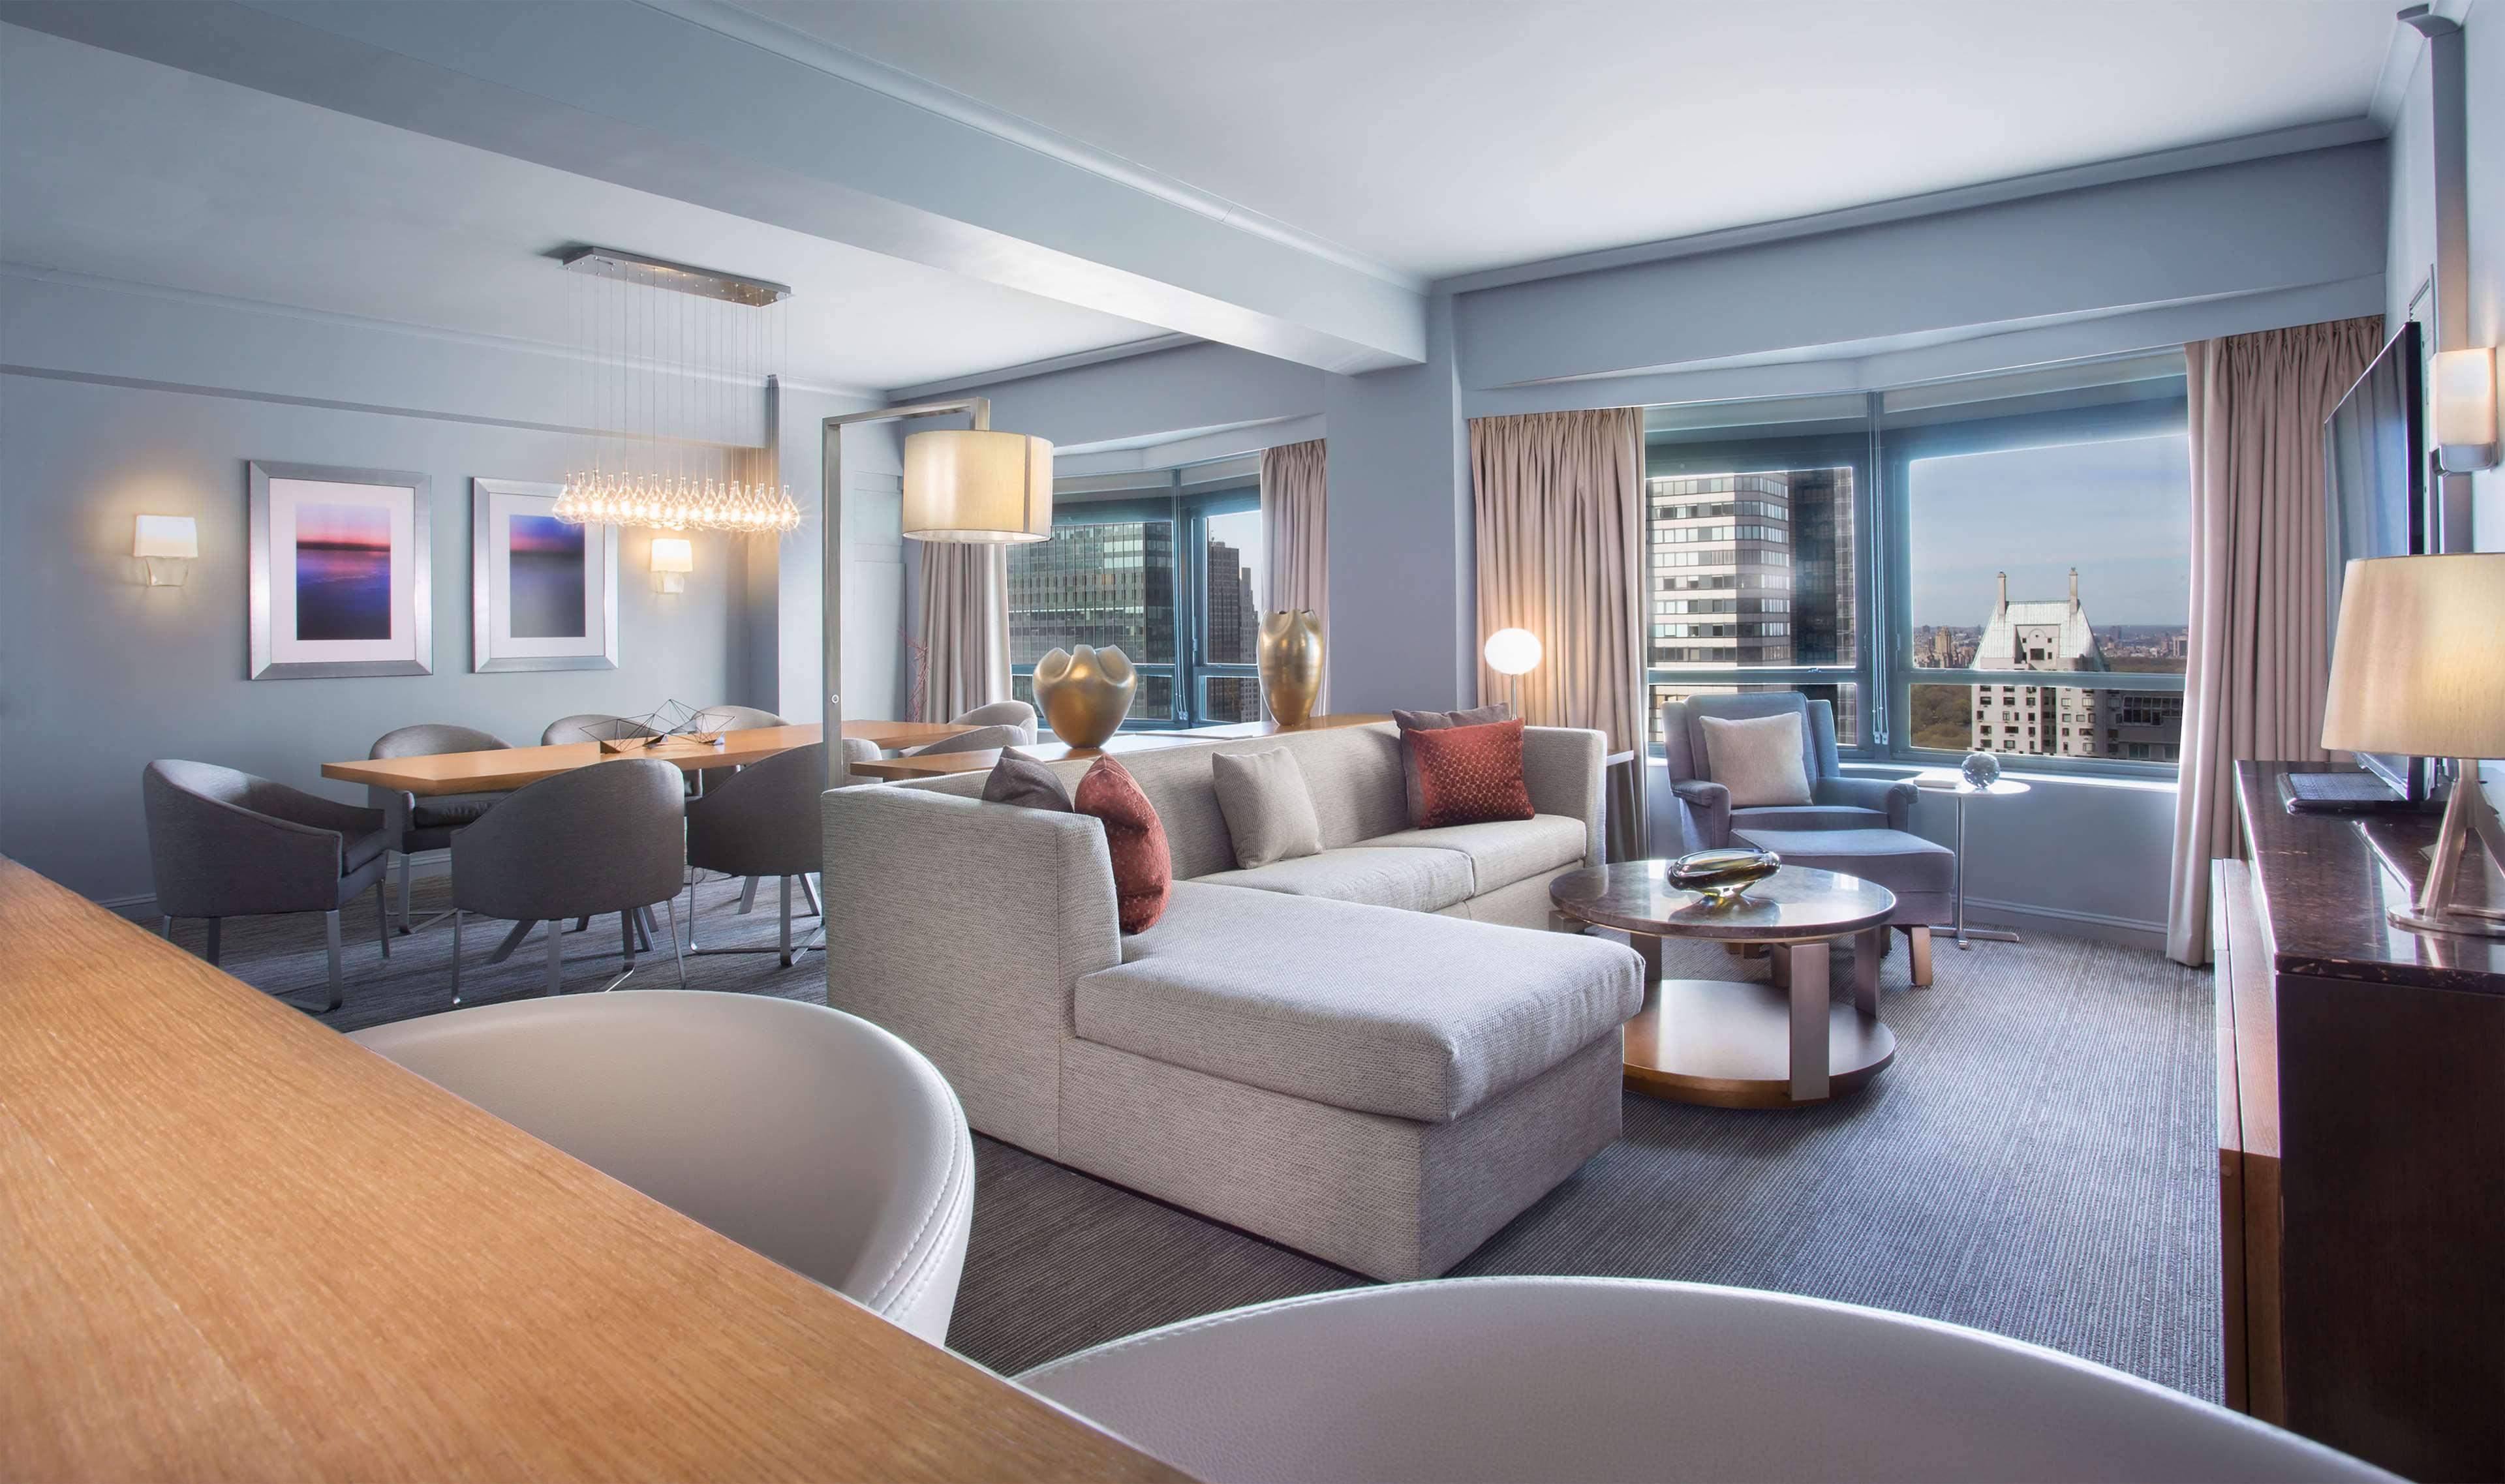 New York Hilton Midtown image 13